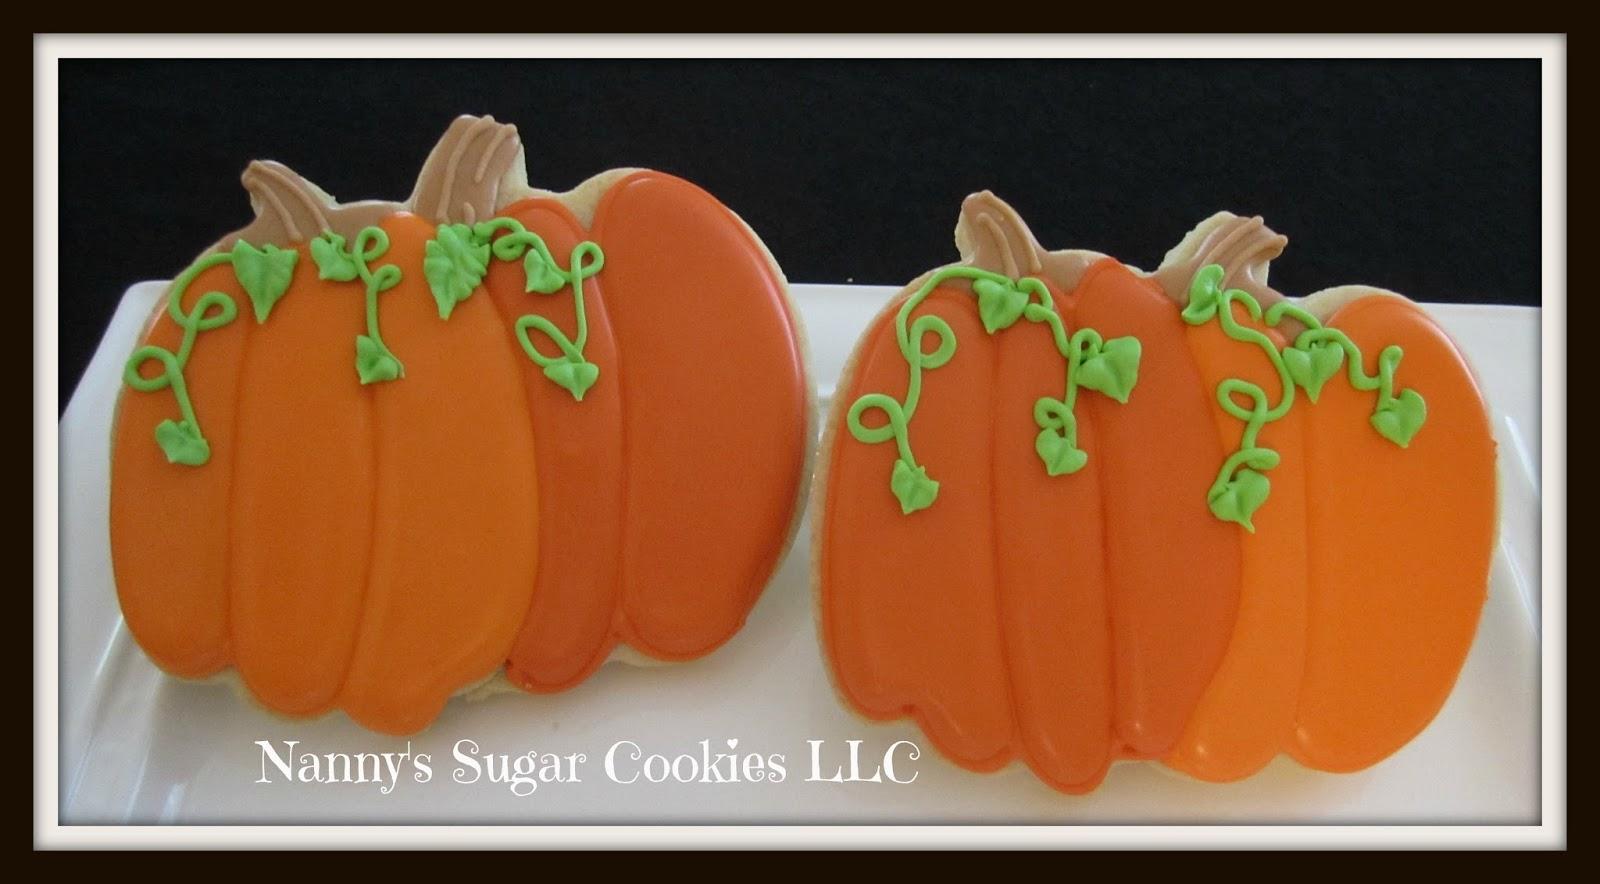 Nanny's Sugar Cookies LLC: September 2016